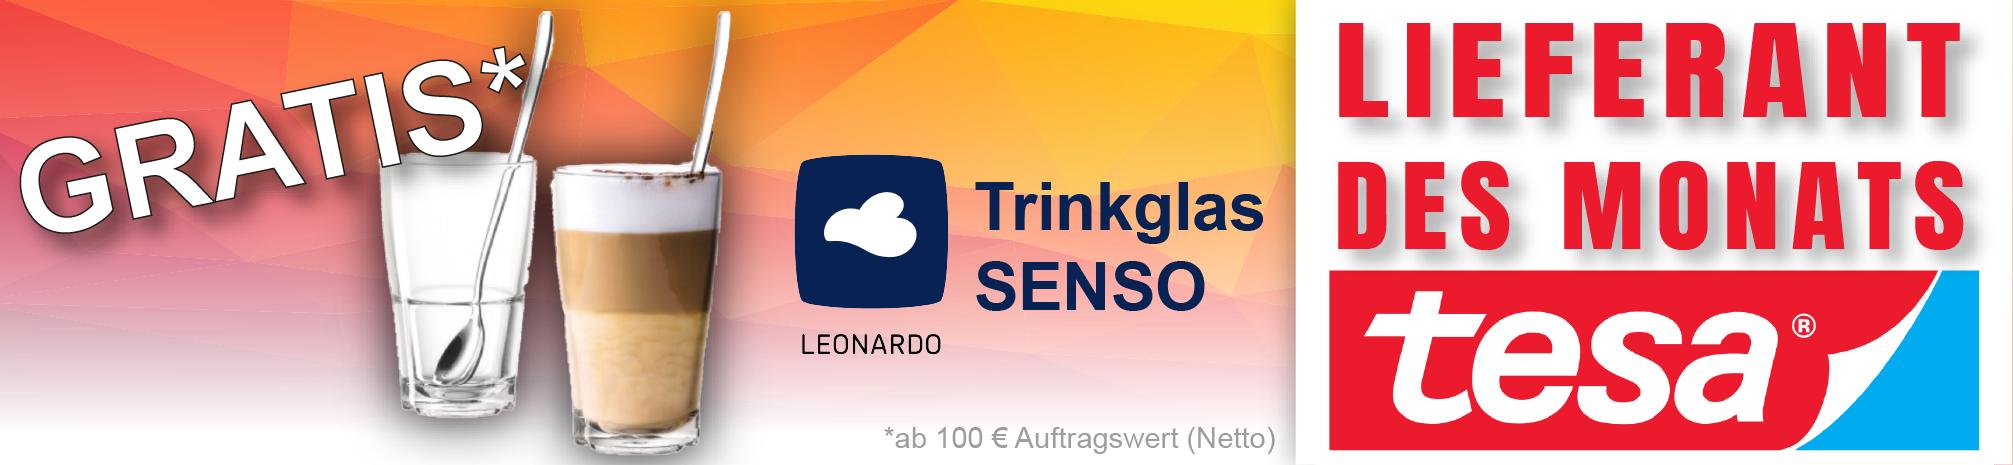 tesa - GRATIS Trinkglas